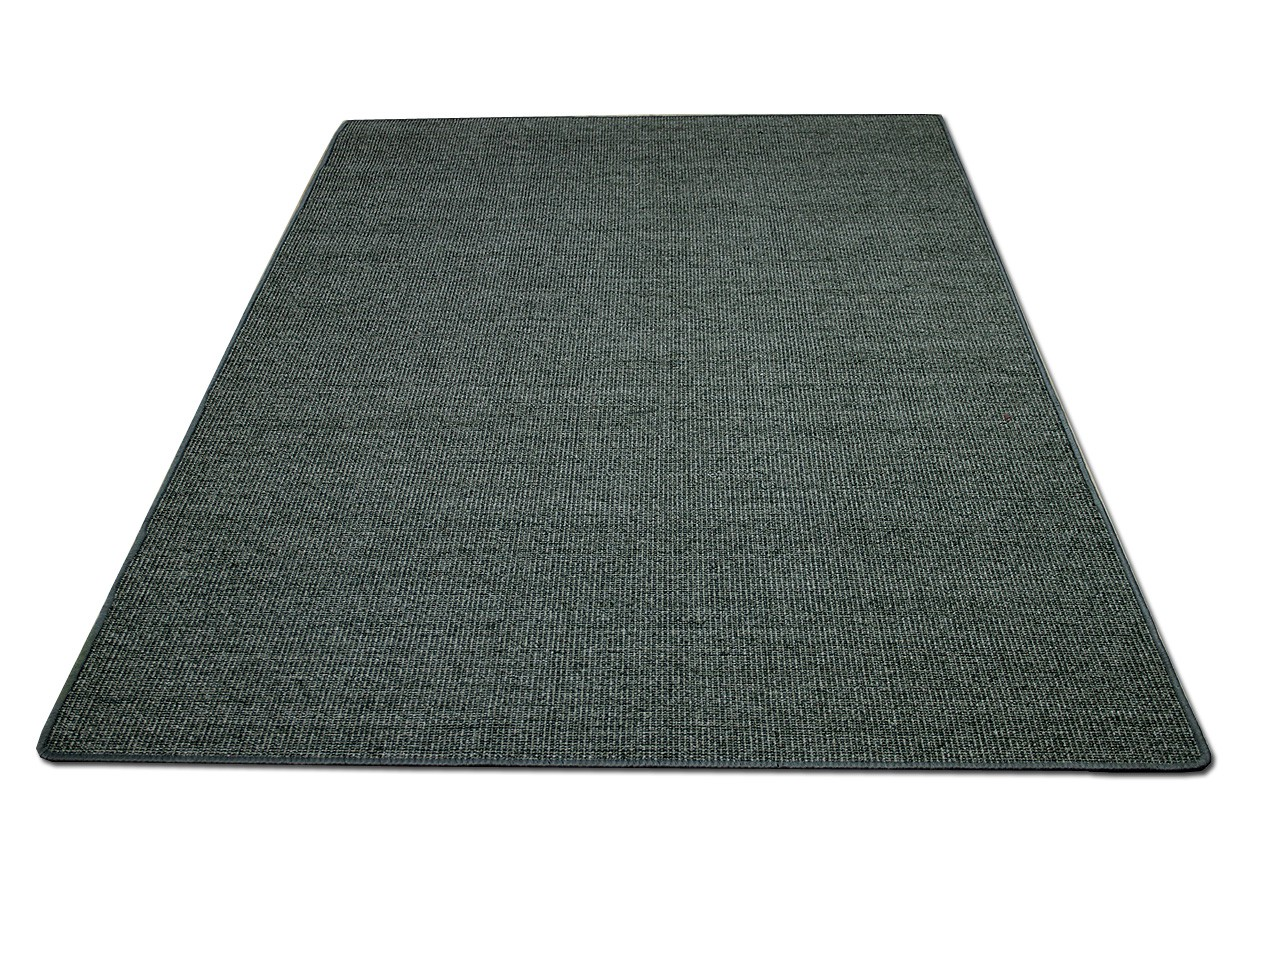 sisal natur teppich dekowe grau blau mix kaufen bei. Black Bedroom Furniture Sets. Home Design Ideas